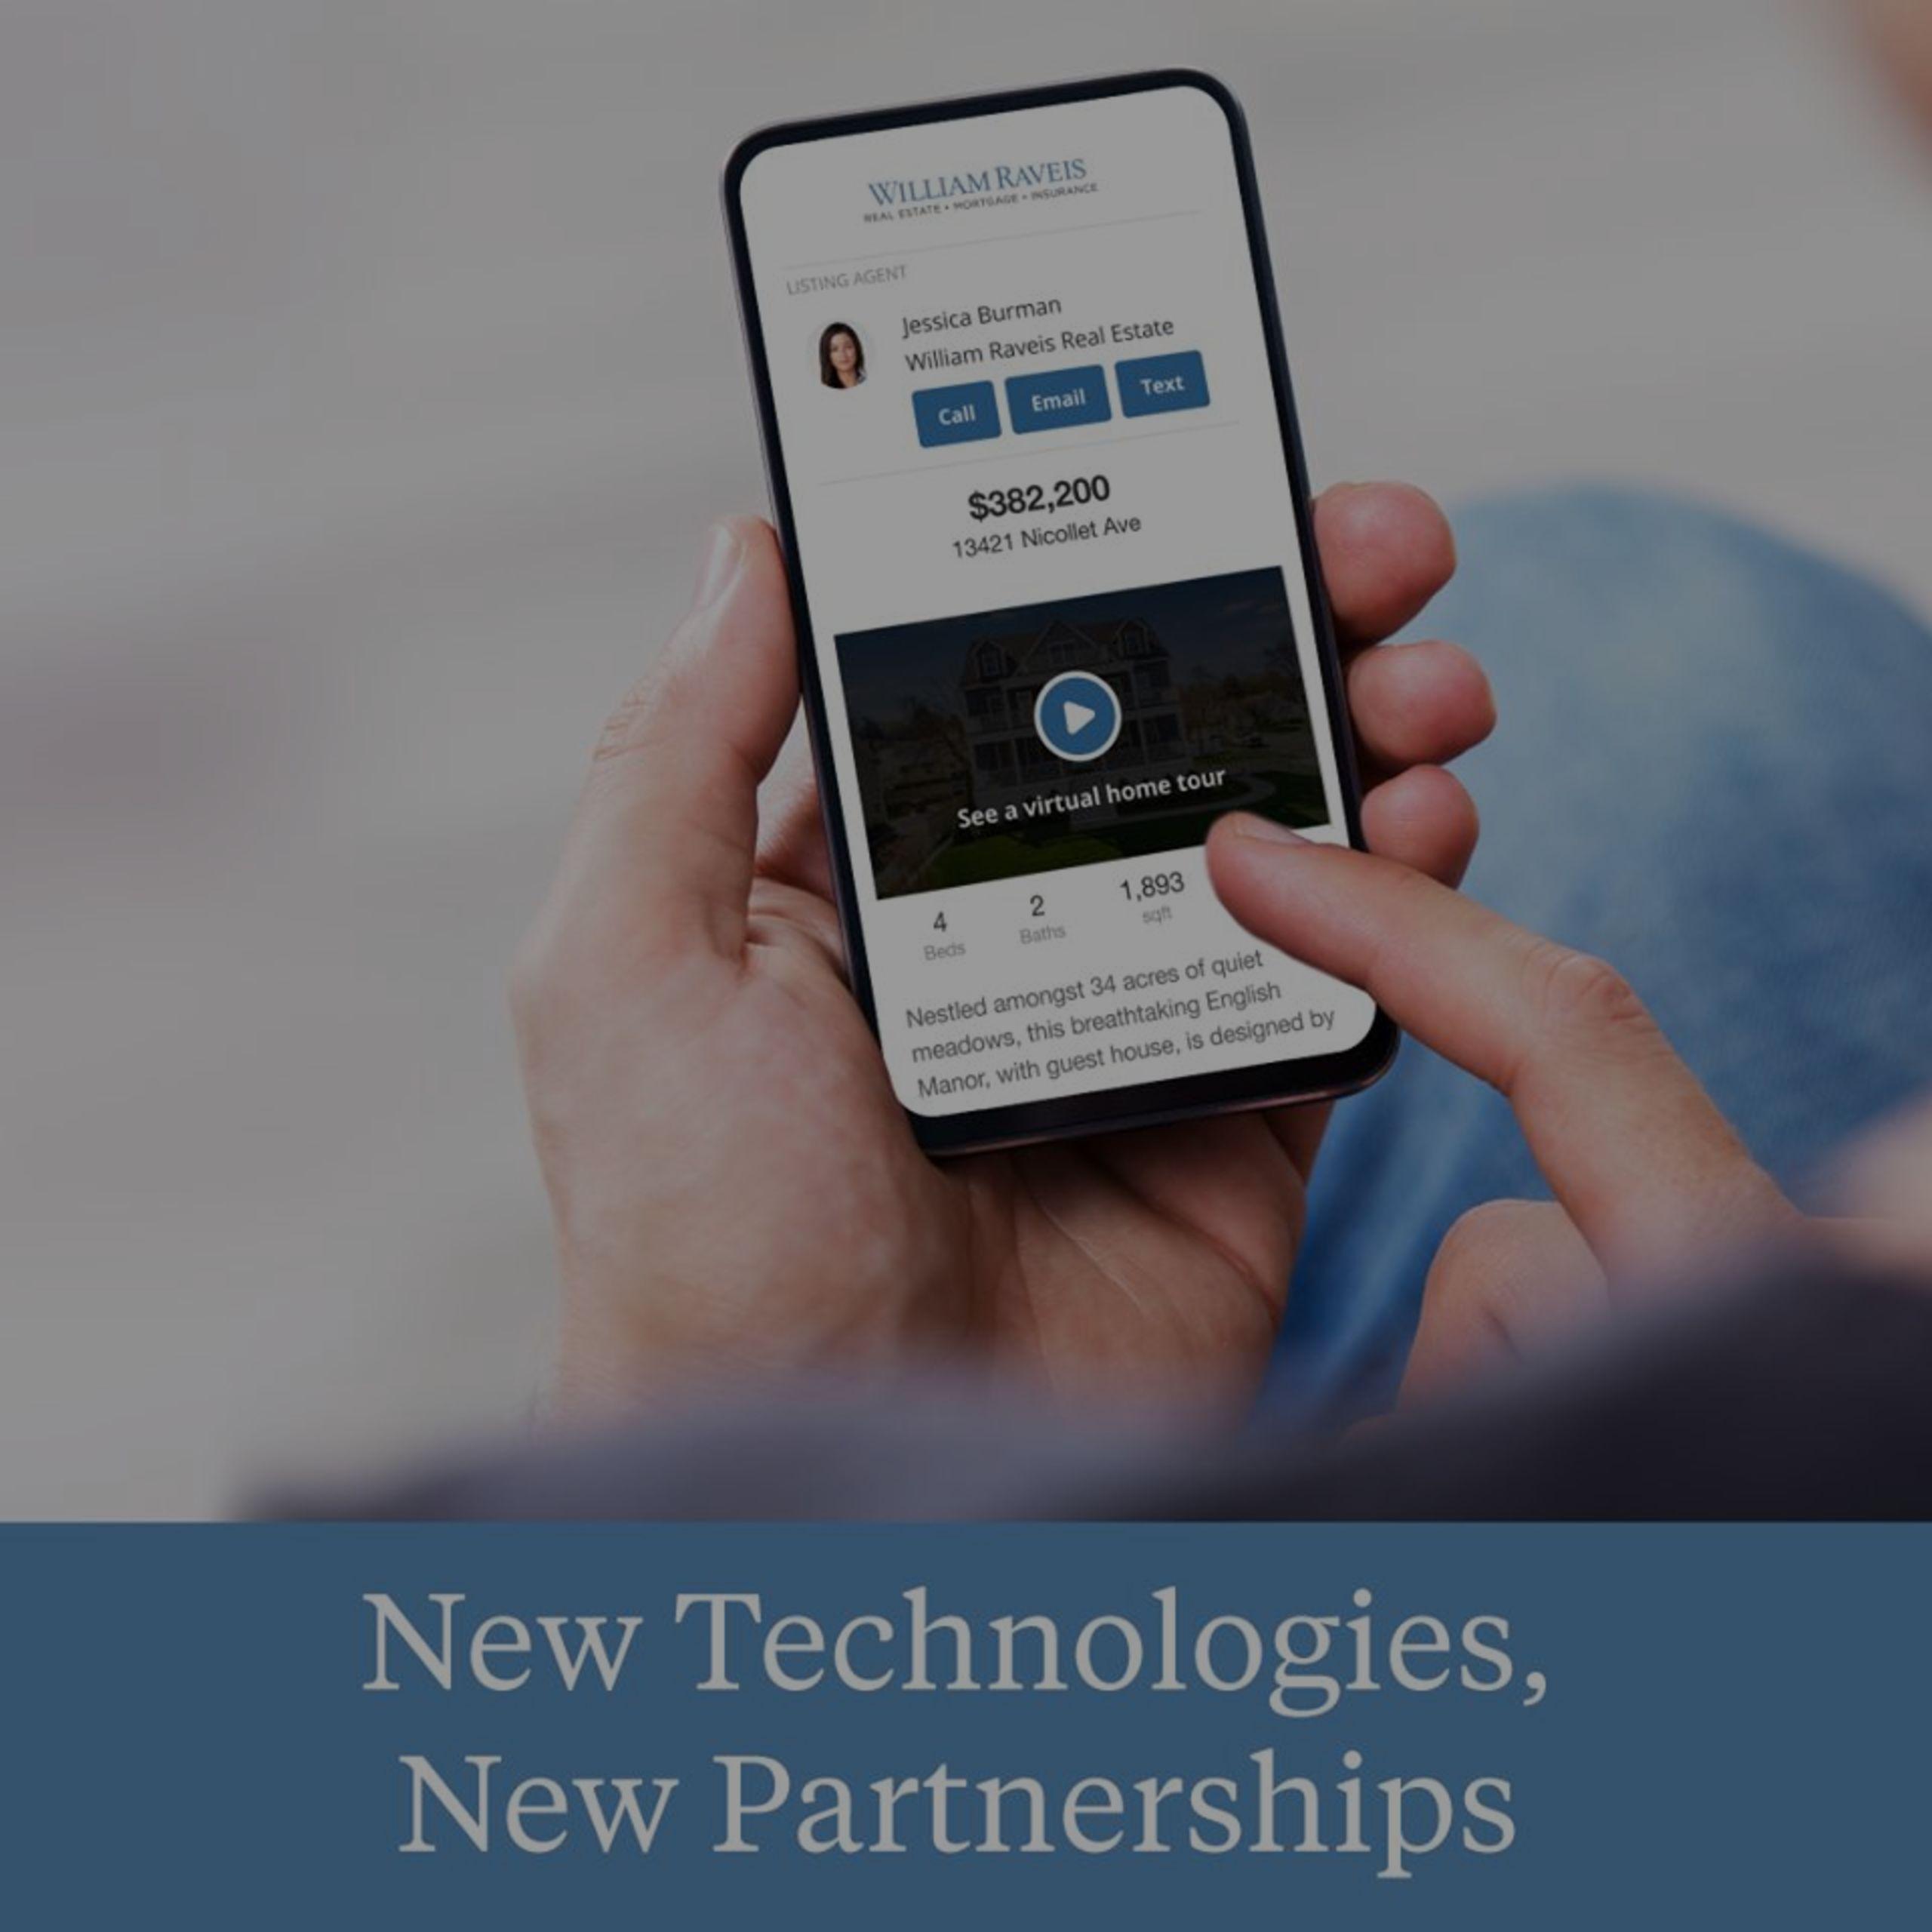 New Technologies, New Partnerships